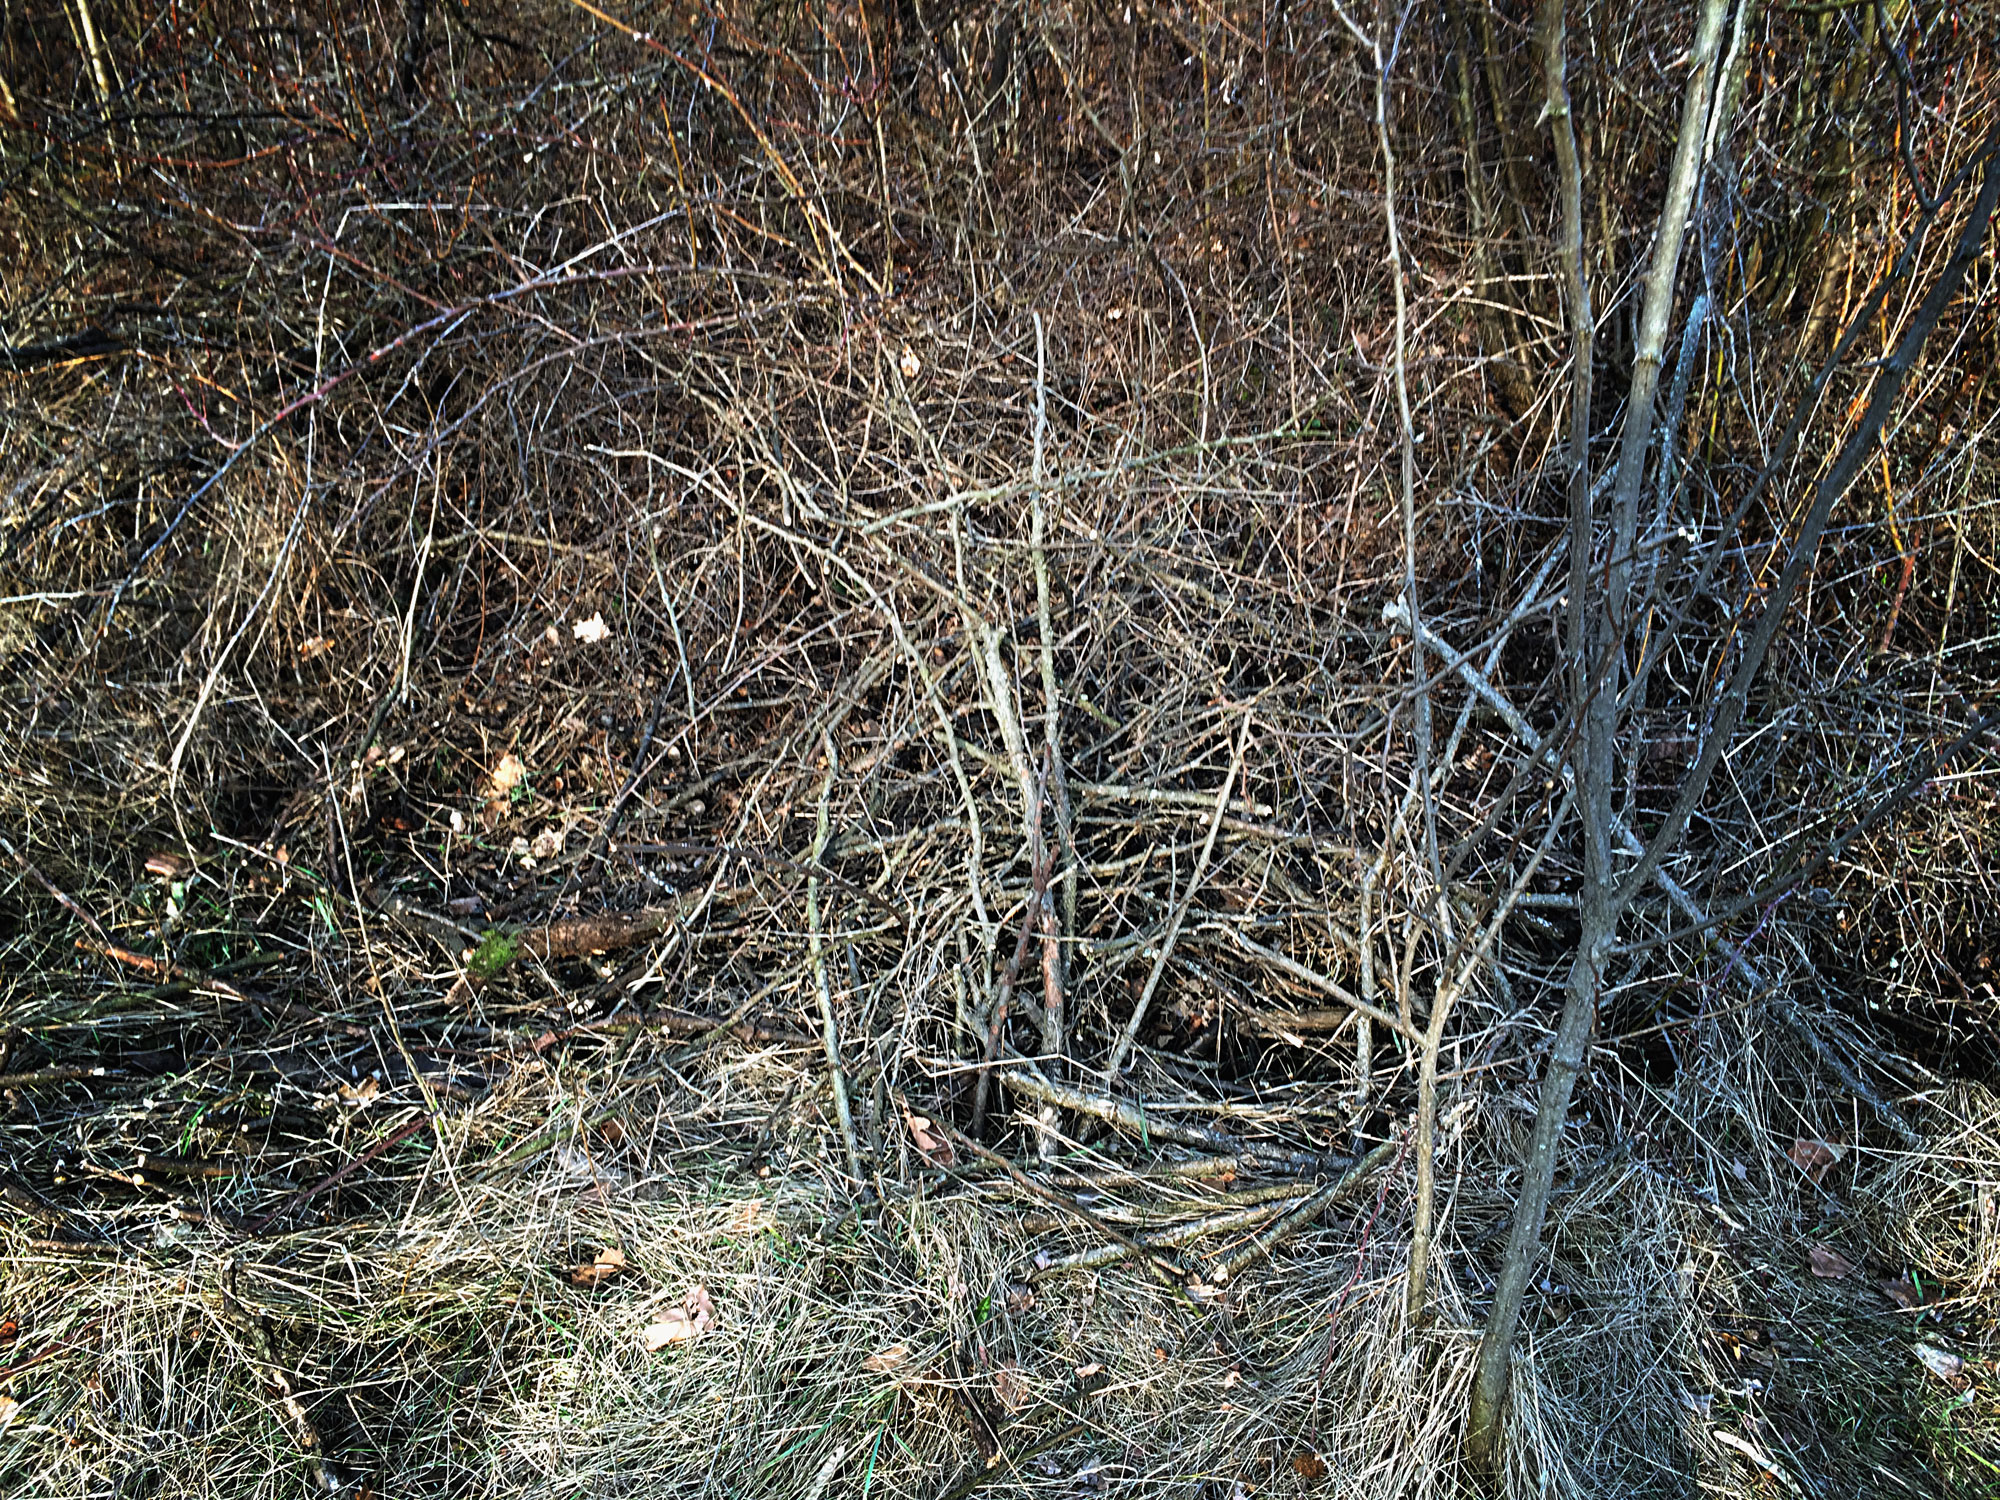 Morman de crengi - Habitat pentru vipera lui Nikolsky (Vipera berus nikolskii)